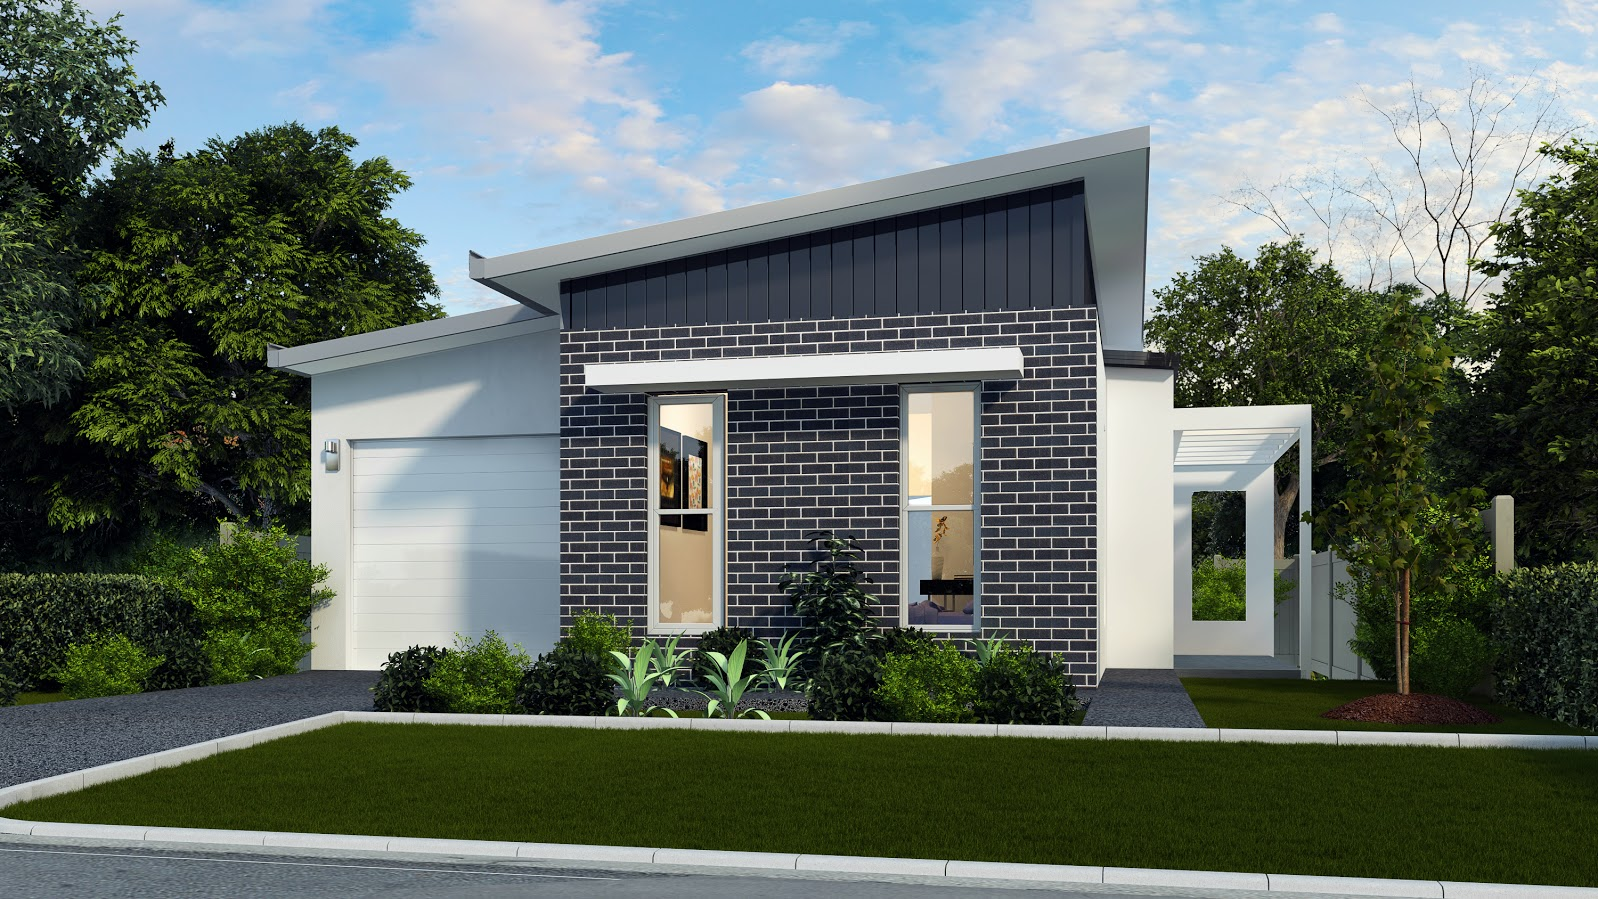 The Abode Alfresco - 3 Bed | 2 Bath | 2 Car Tandem Garage10m Traditional Lots